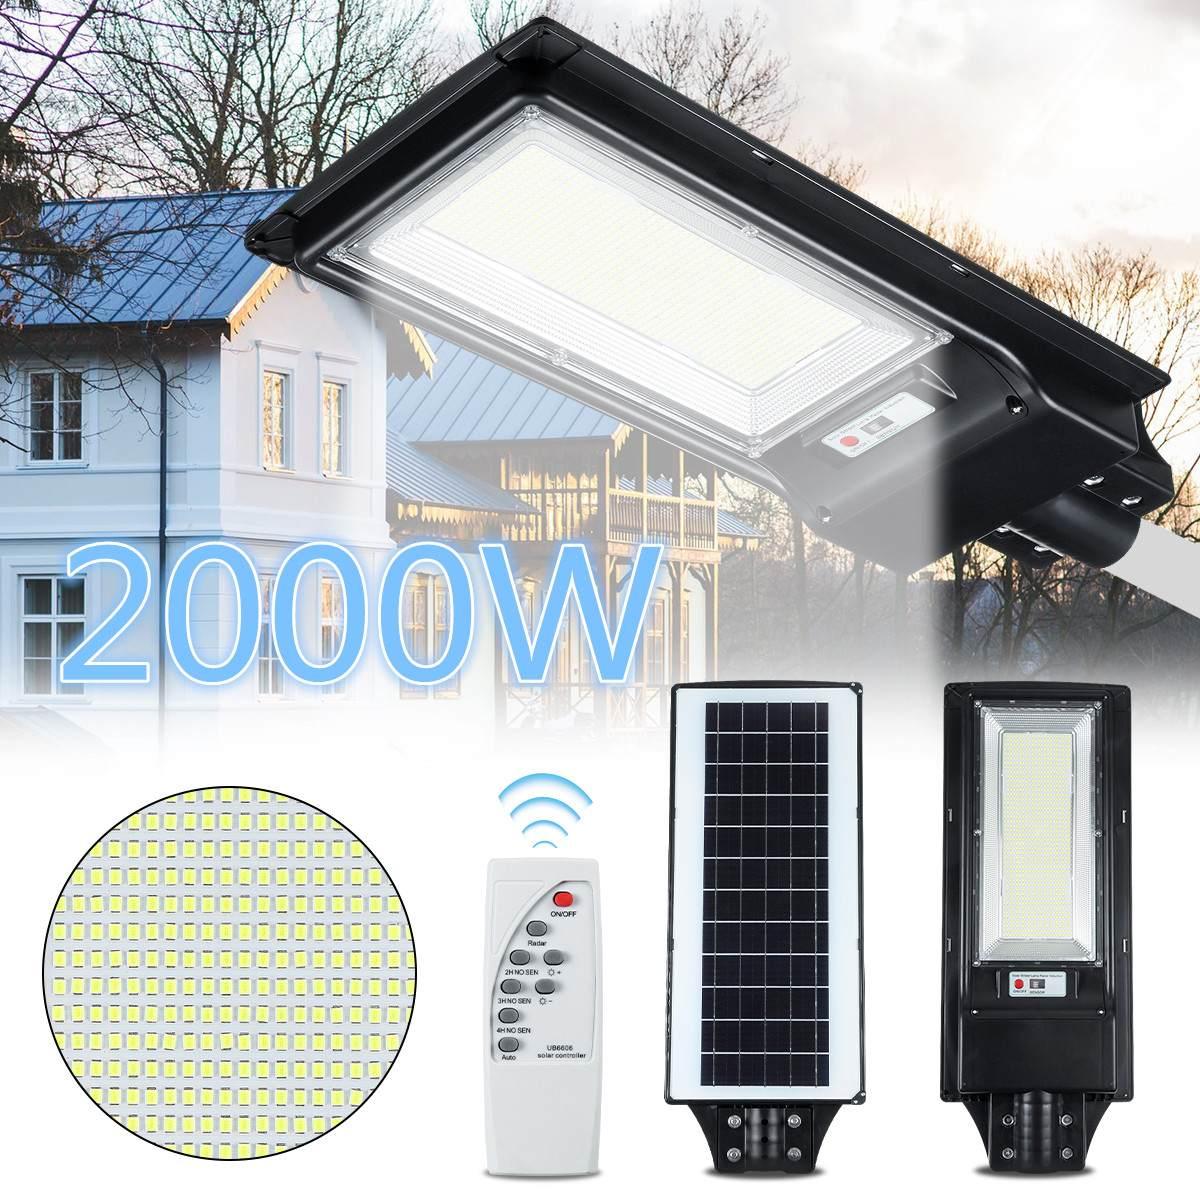 LED Solar Street Light 1000W 2000W PIR Motion Sensor Wall Lamp Human Body Infrared Outdoor Waterproof Home Garden Security Light